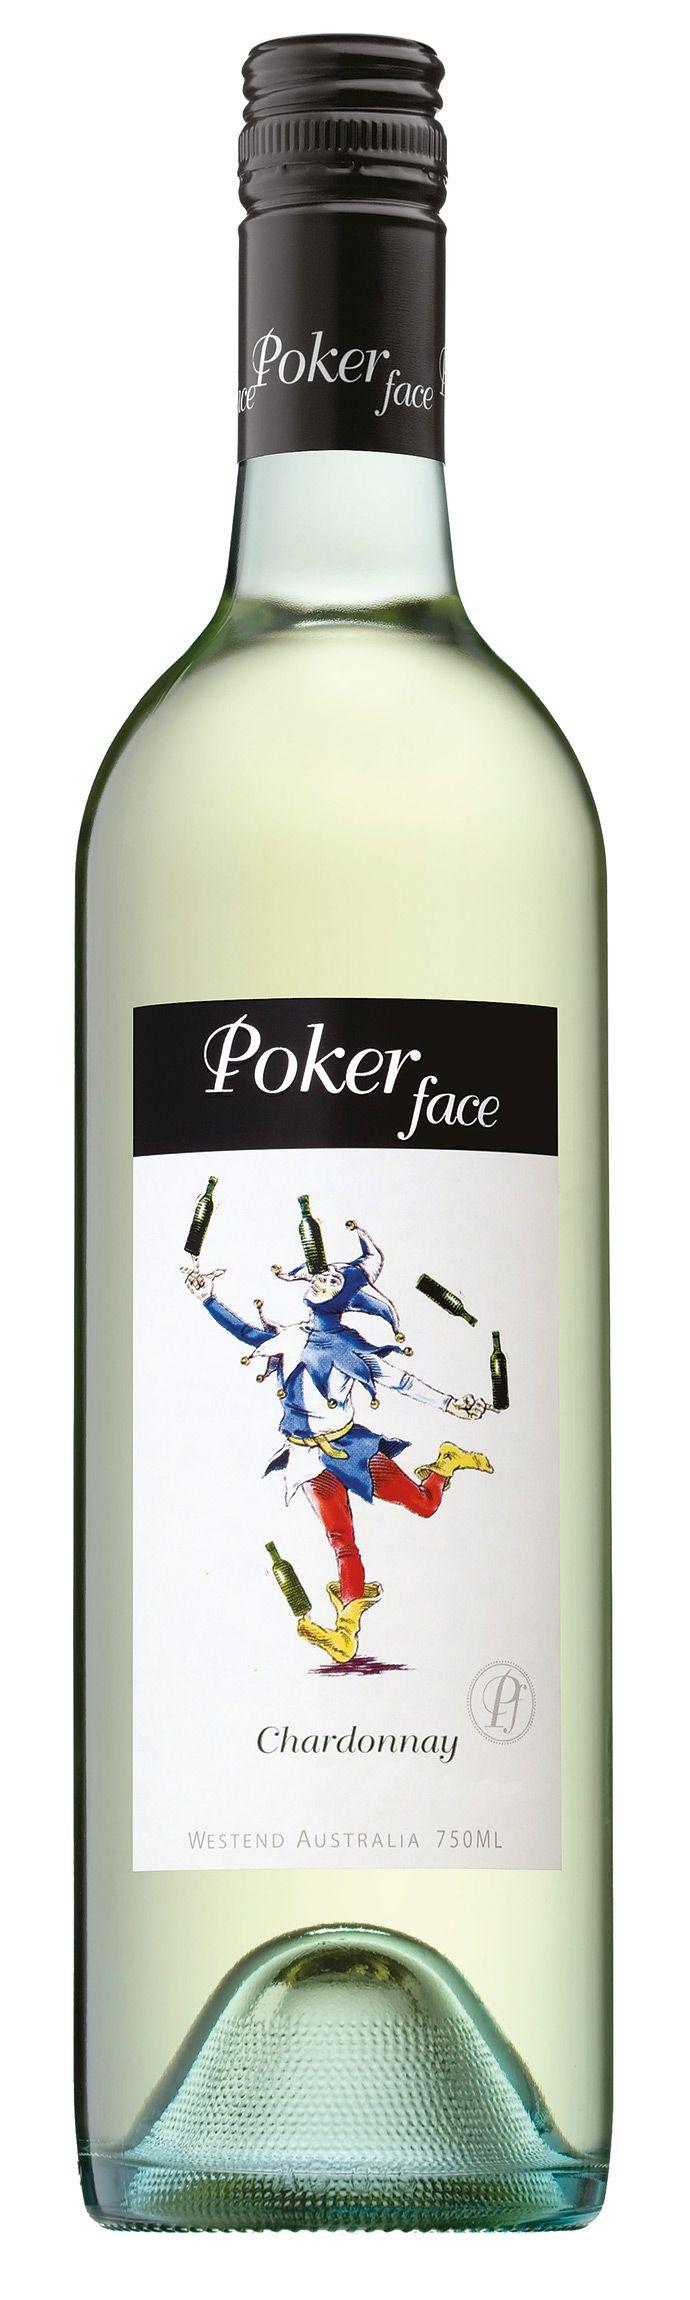 Image of Calabria Pokerface Chardonnay 2014